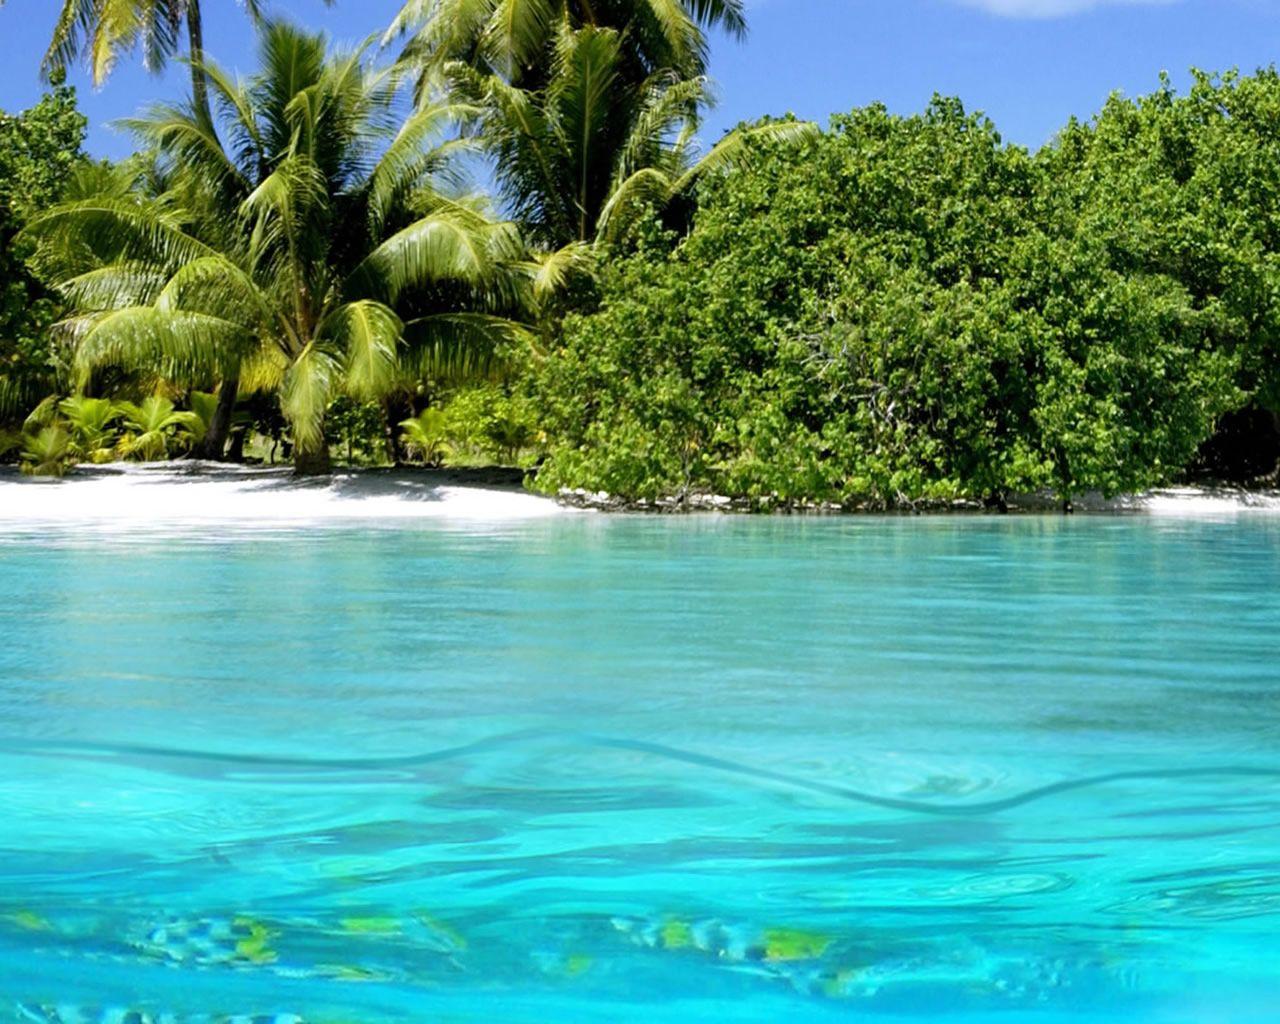 hd wallpapers aruba beach scene desktop wallpaper beaches islands